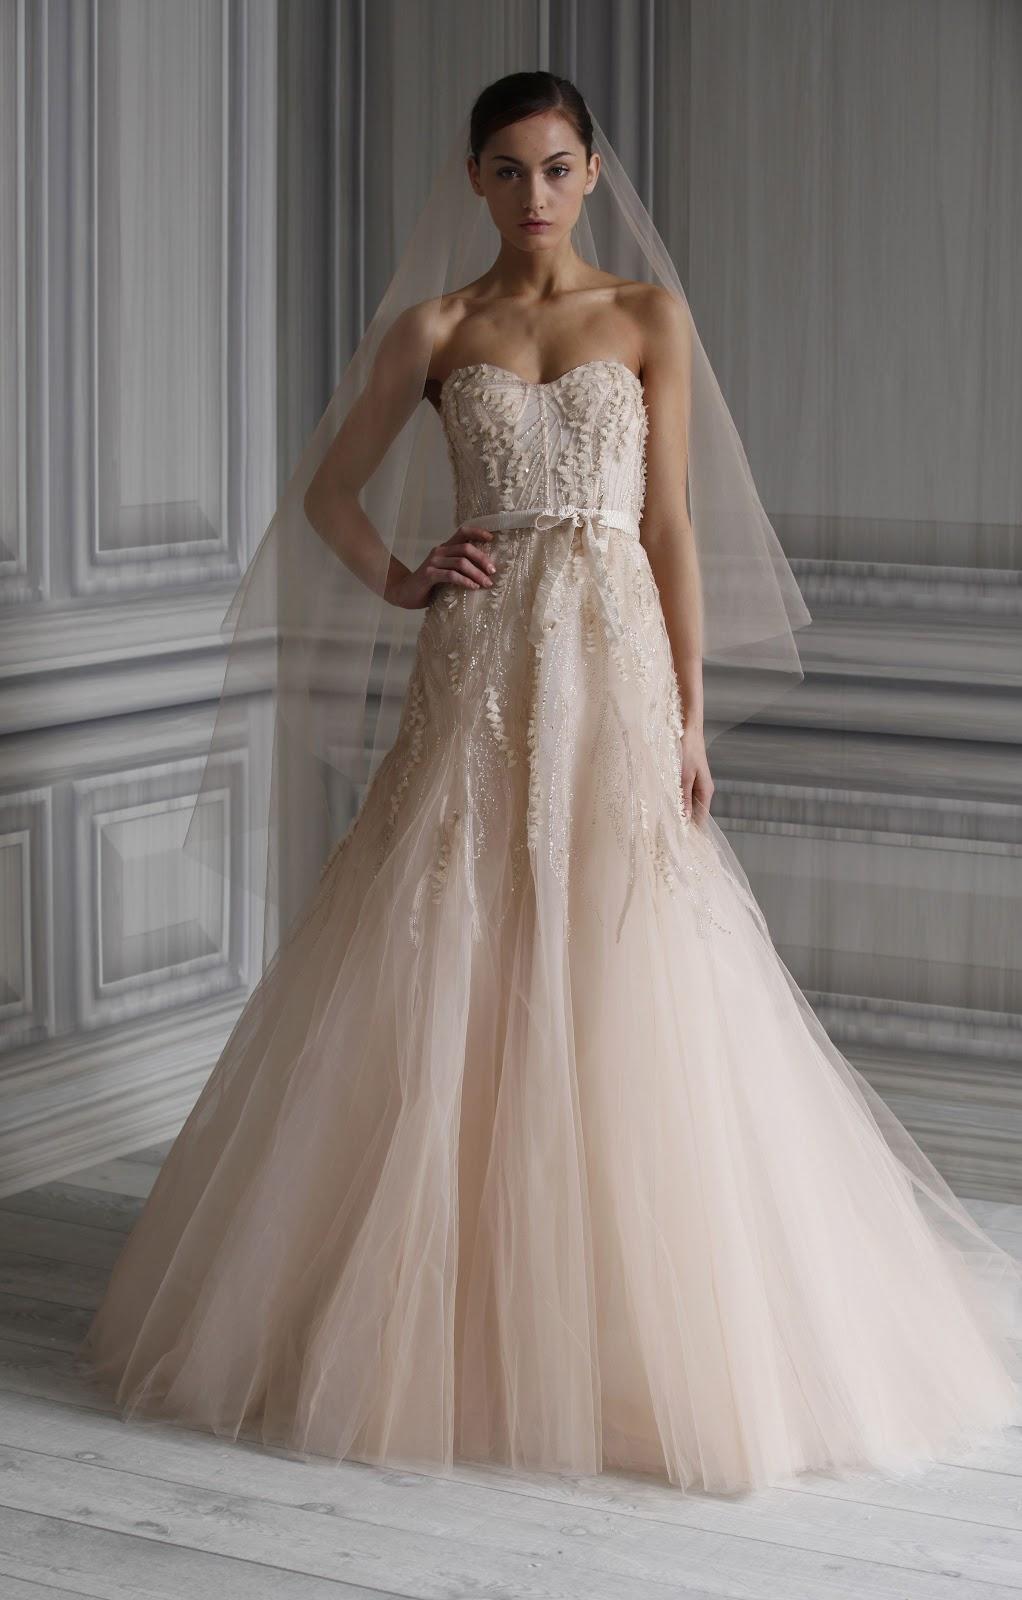 monique wedding dresses photo - 1